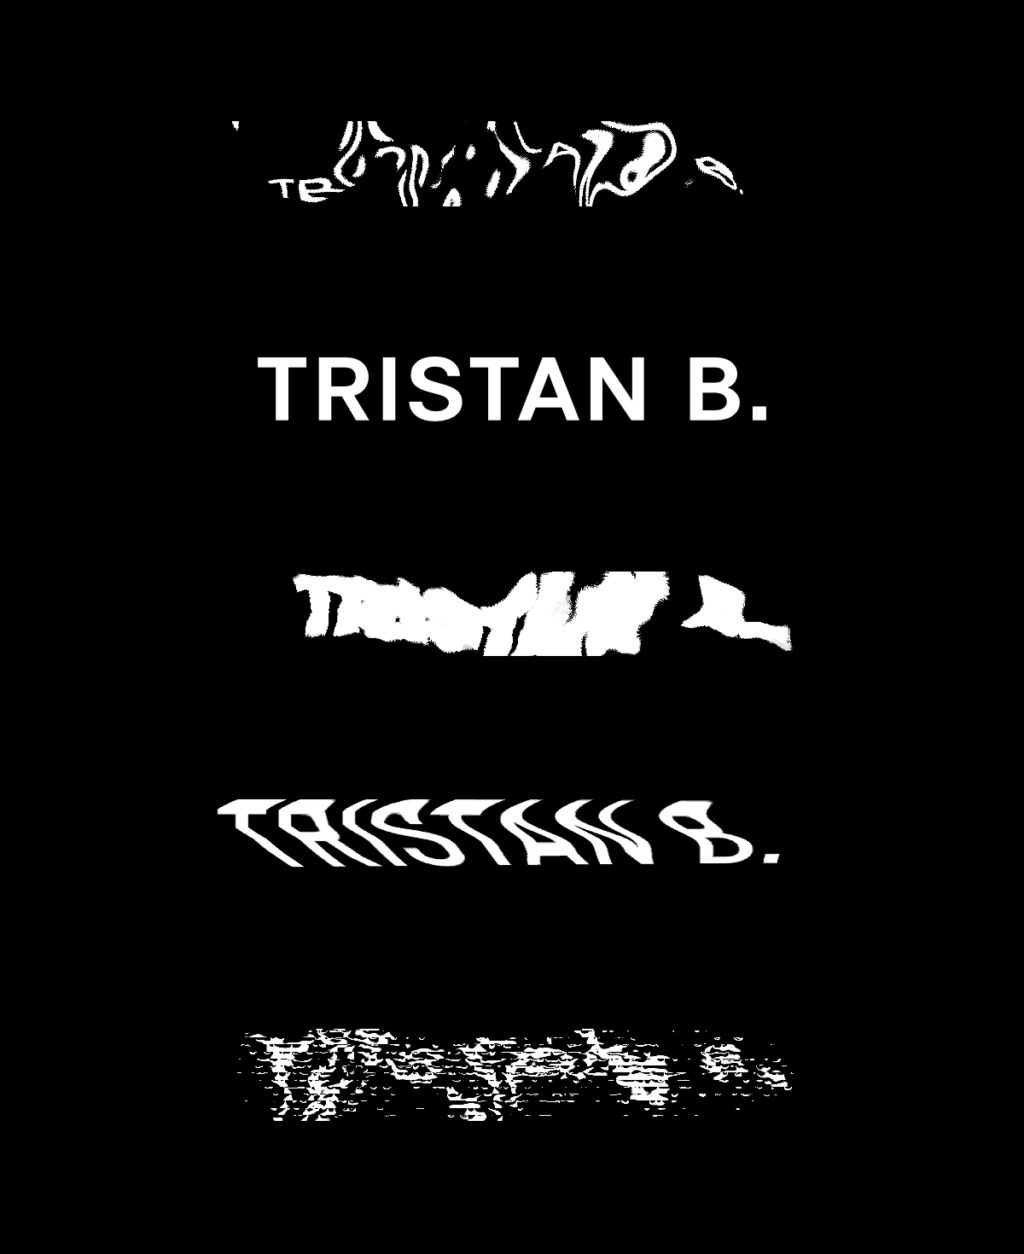 Tristan Bożek About